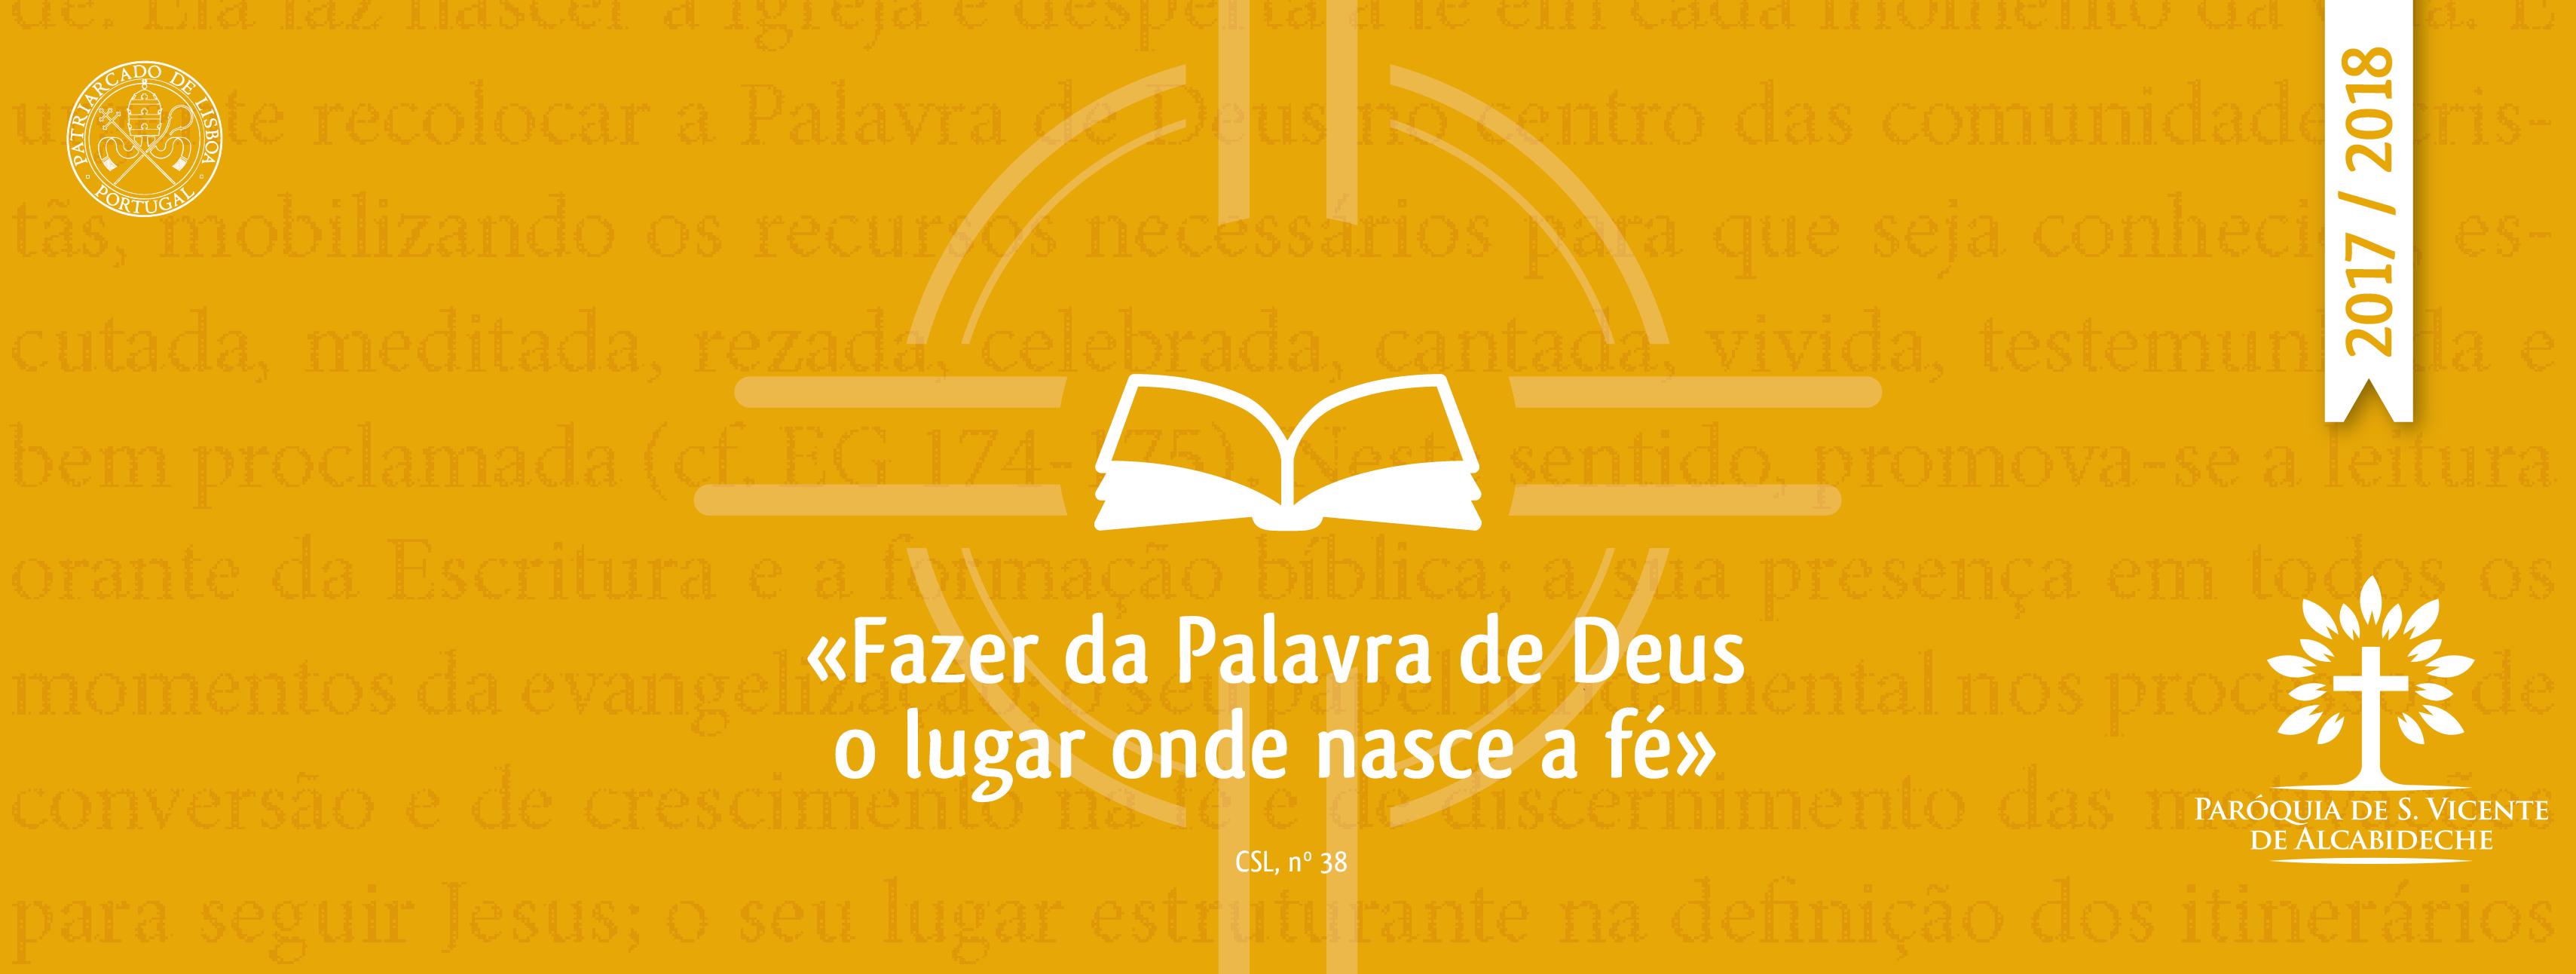 Missa Paroquial  – 29 de Outubro